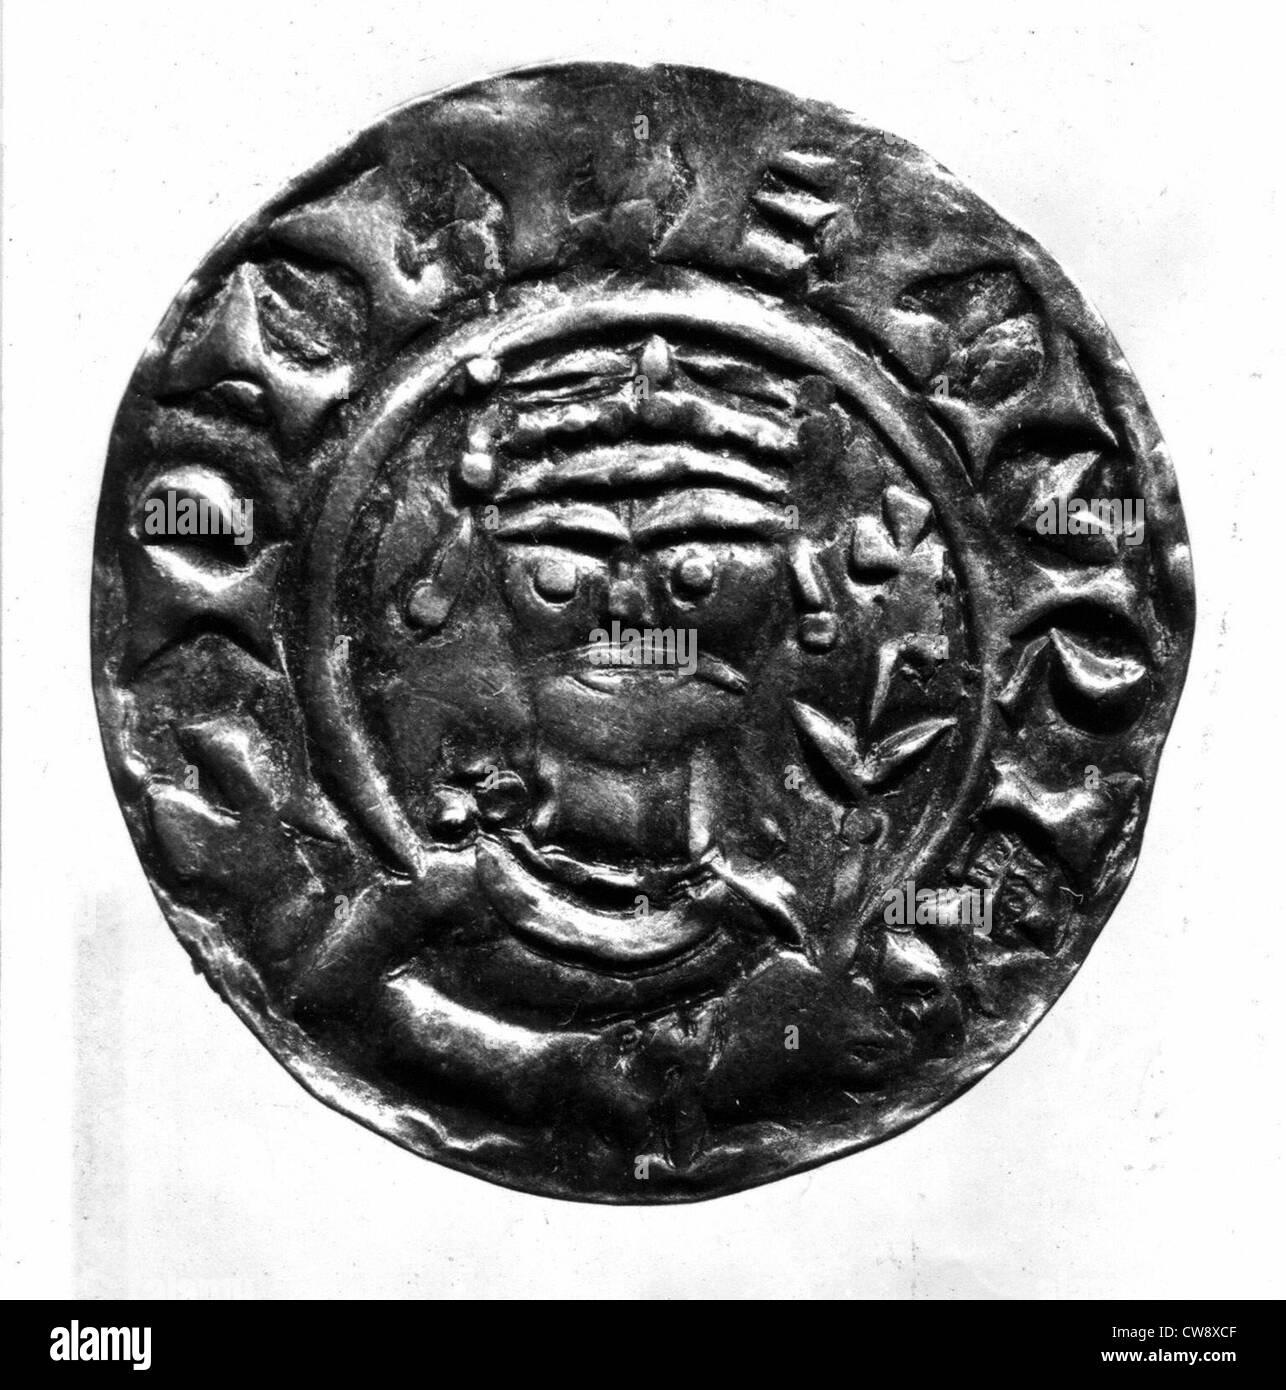 Seal of William the Conqueror - Stock Image